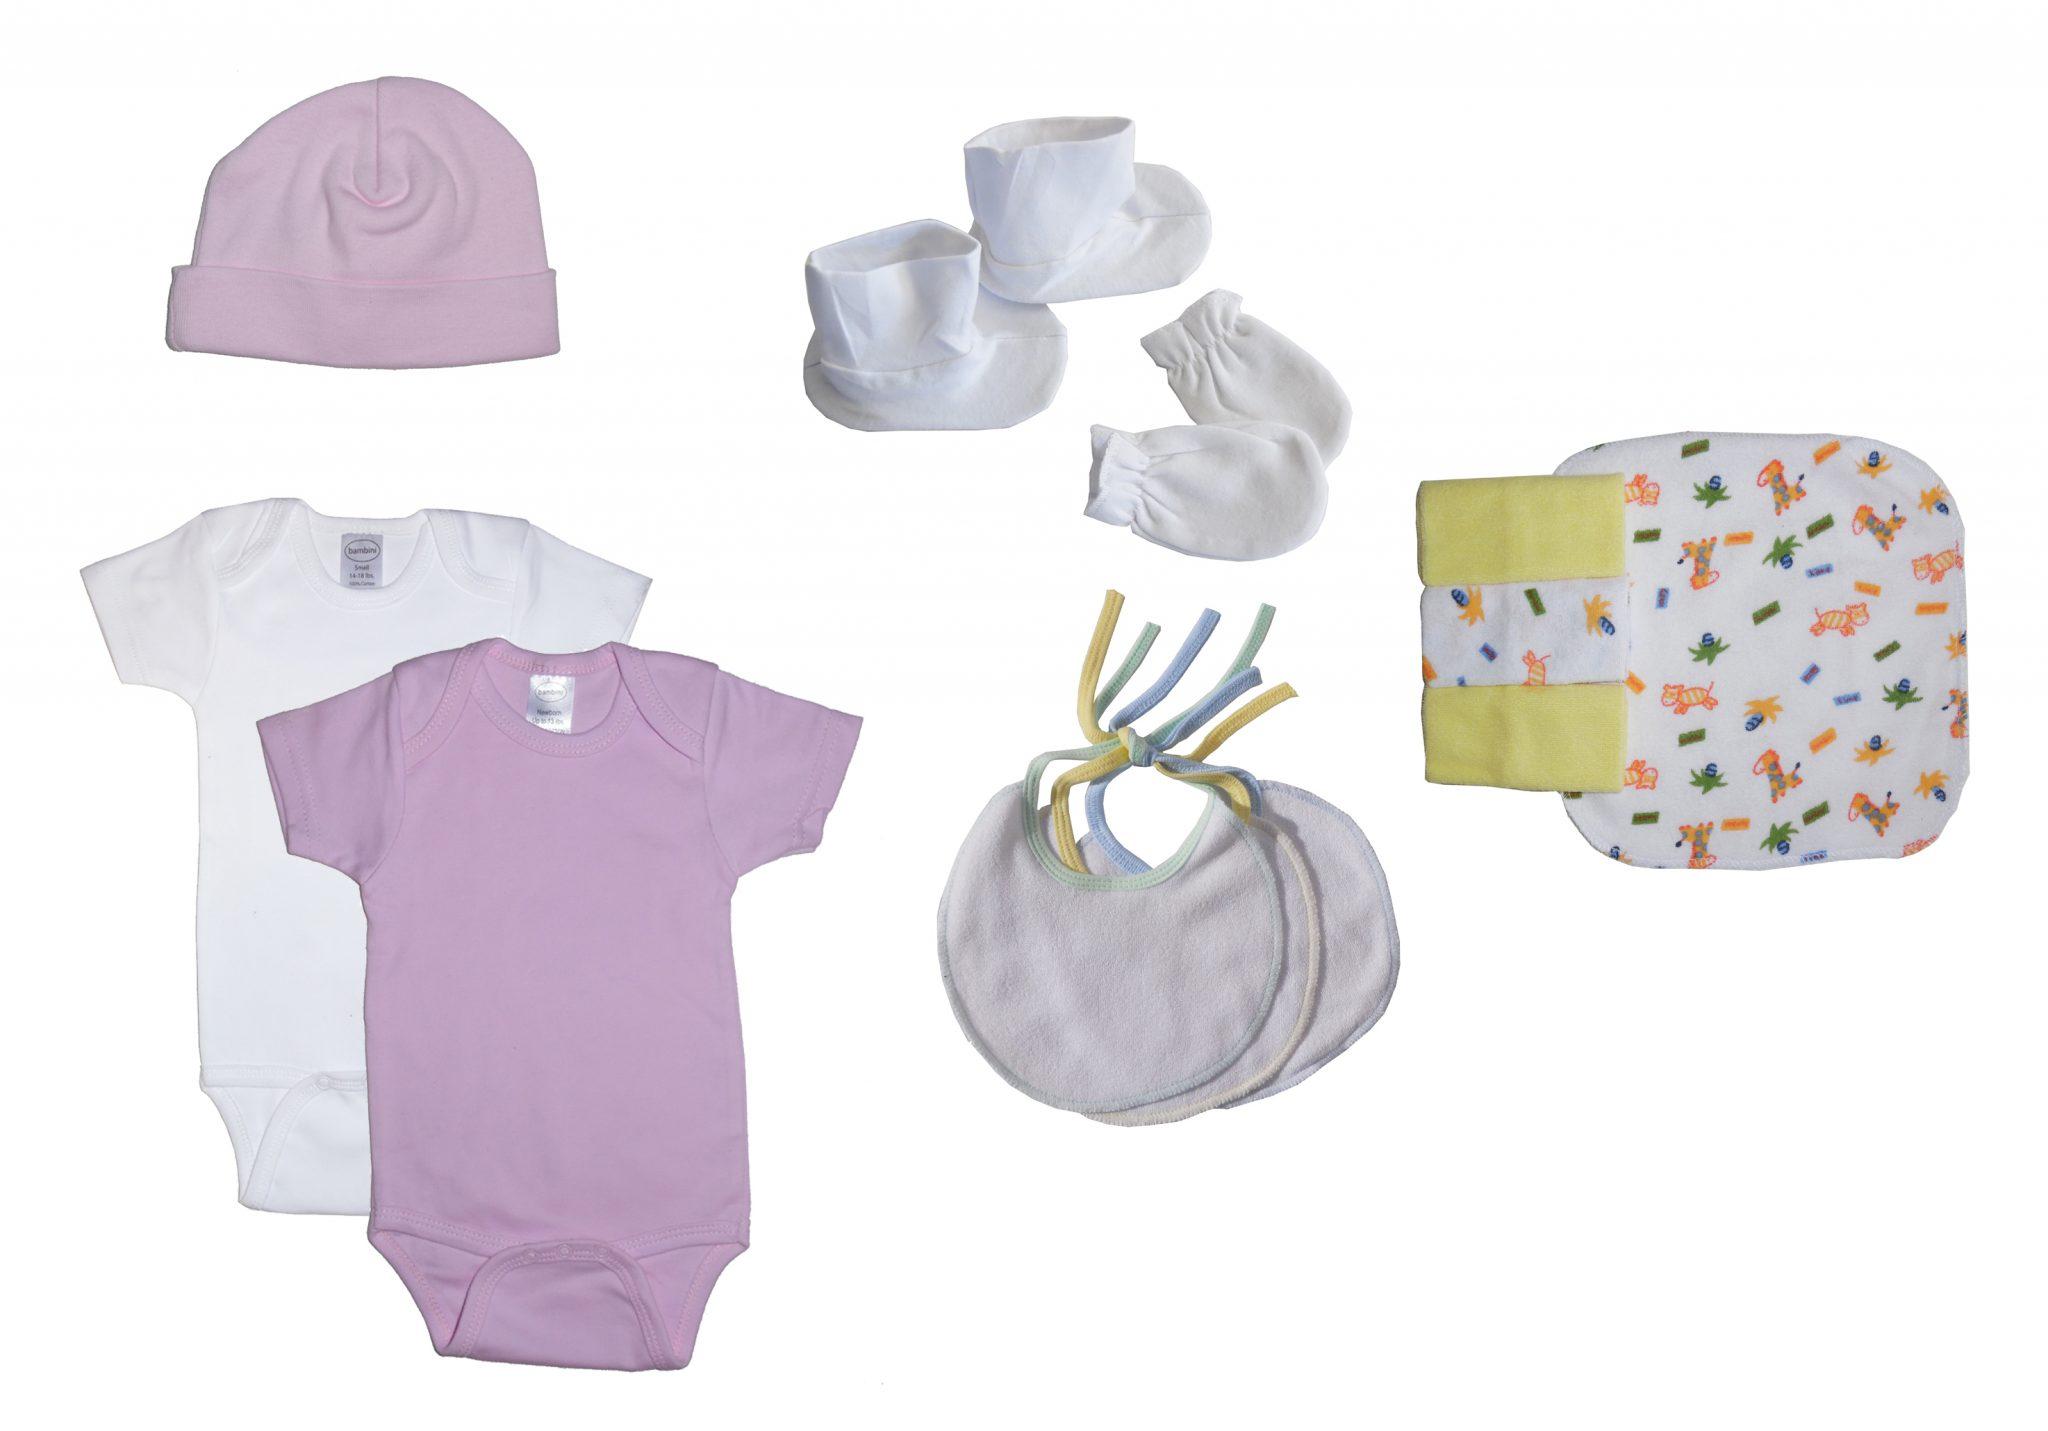 Baby Gift Box Items